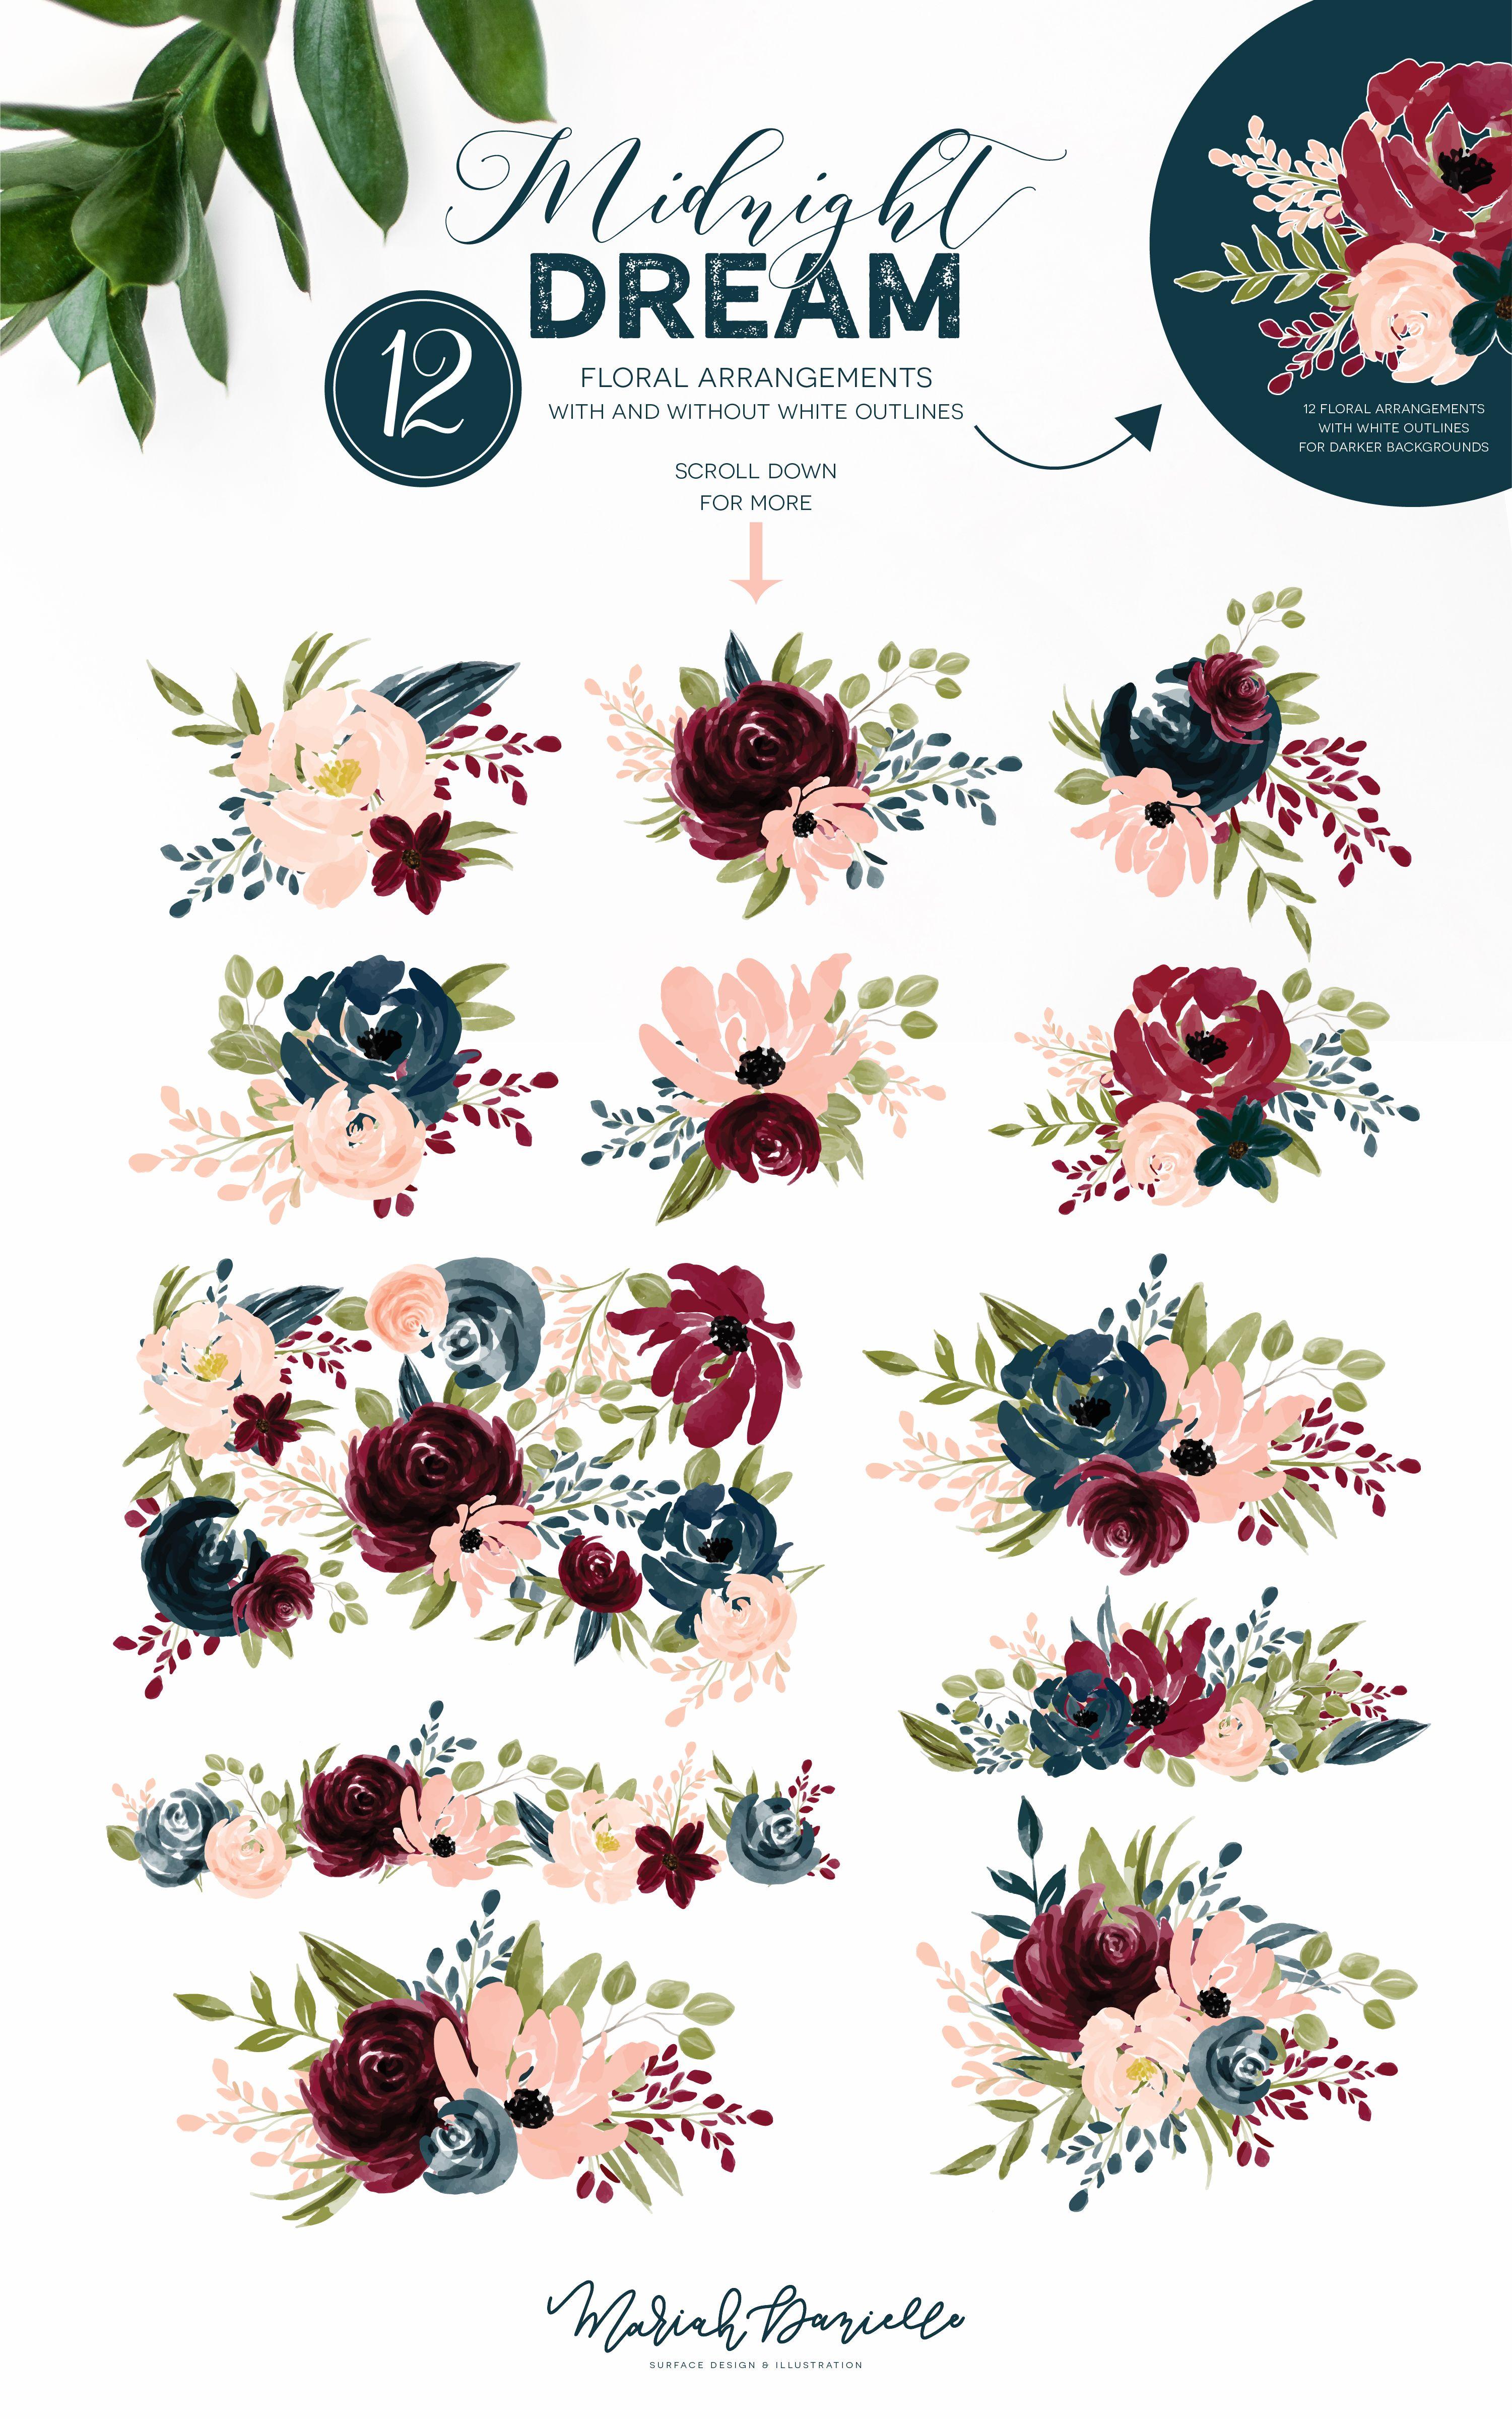 hight resolution of burgundy navy flower graphic set illustrations hand drawn floral illustrations diy wedding